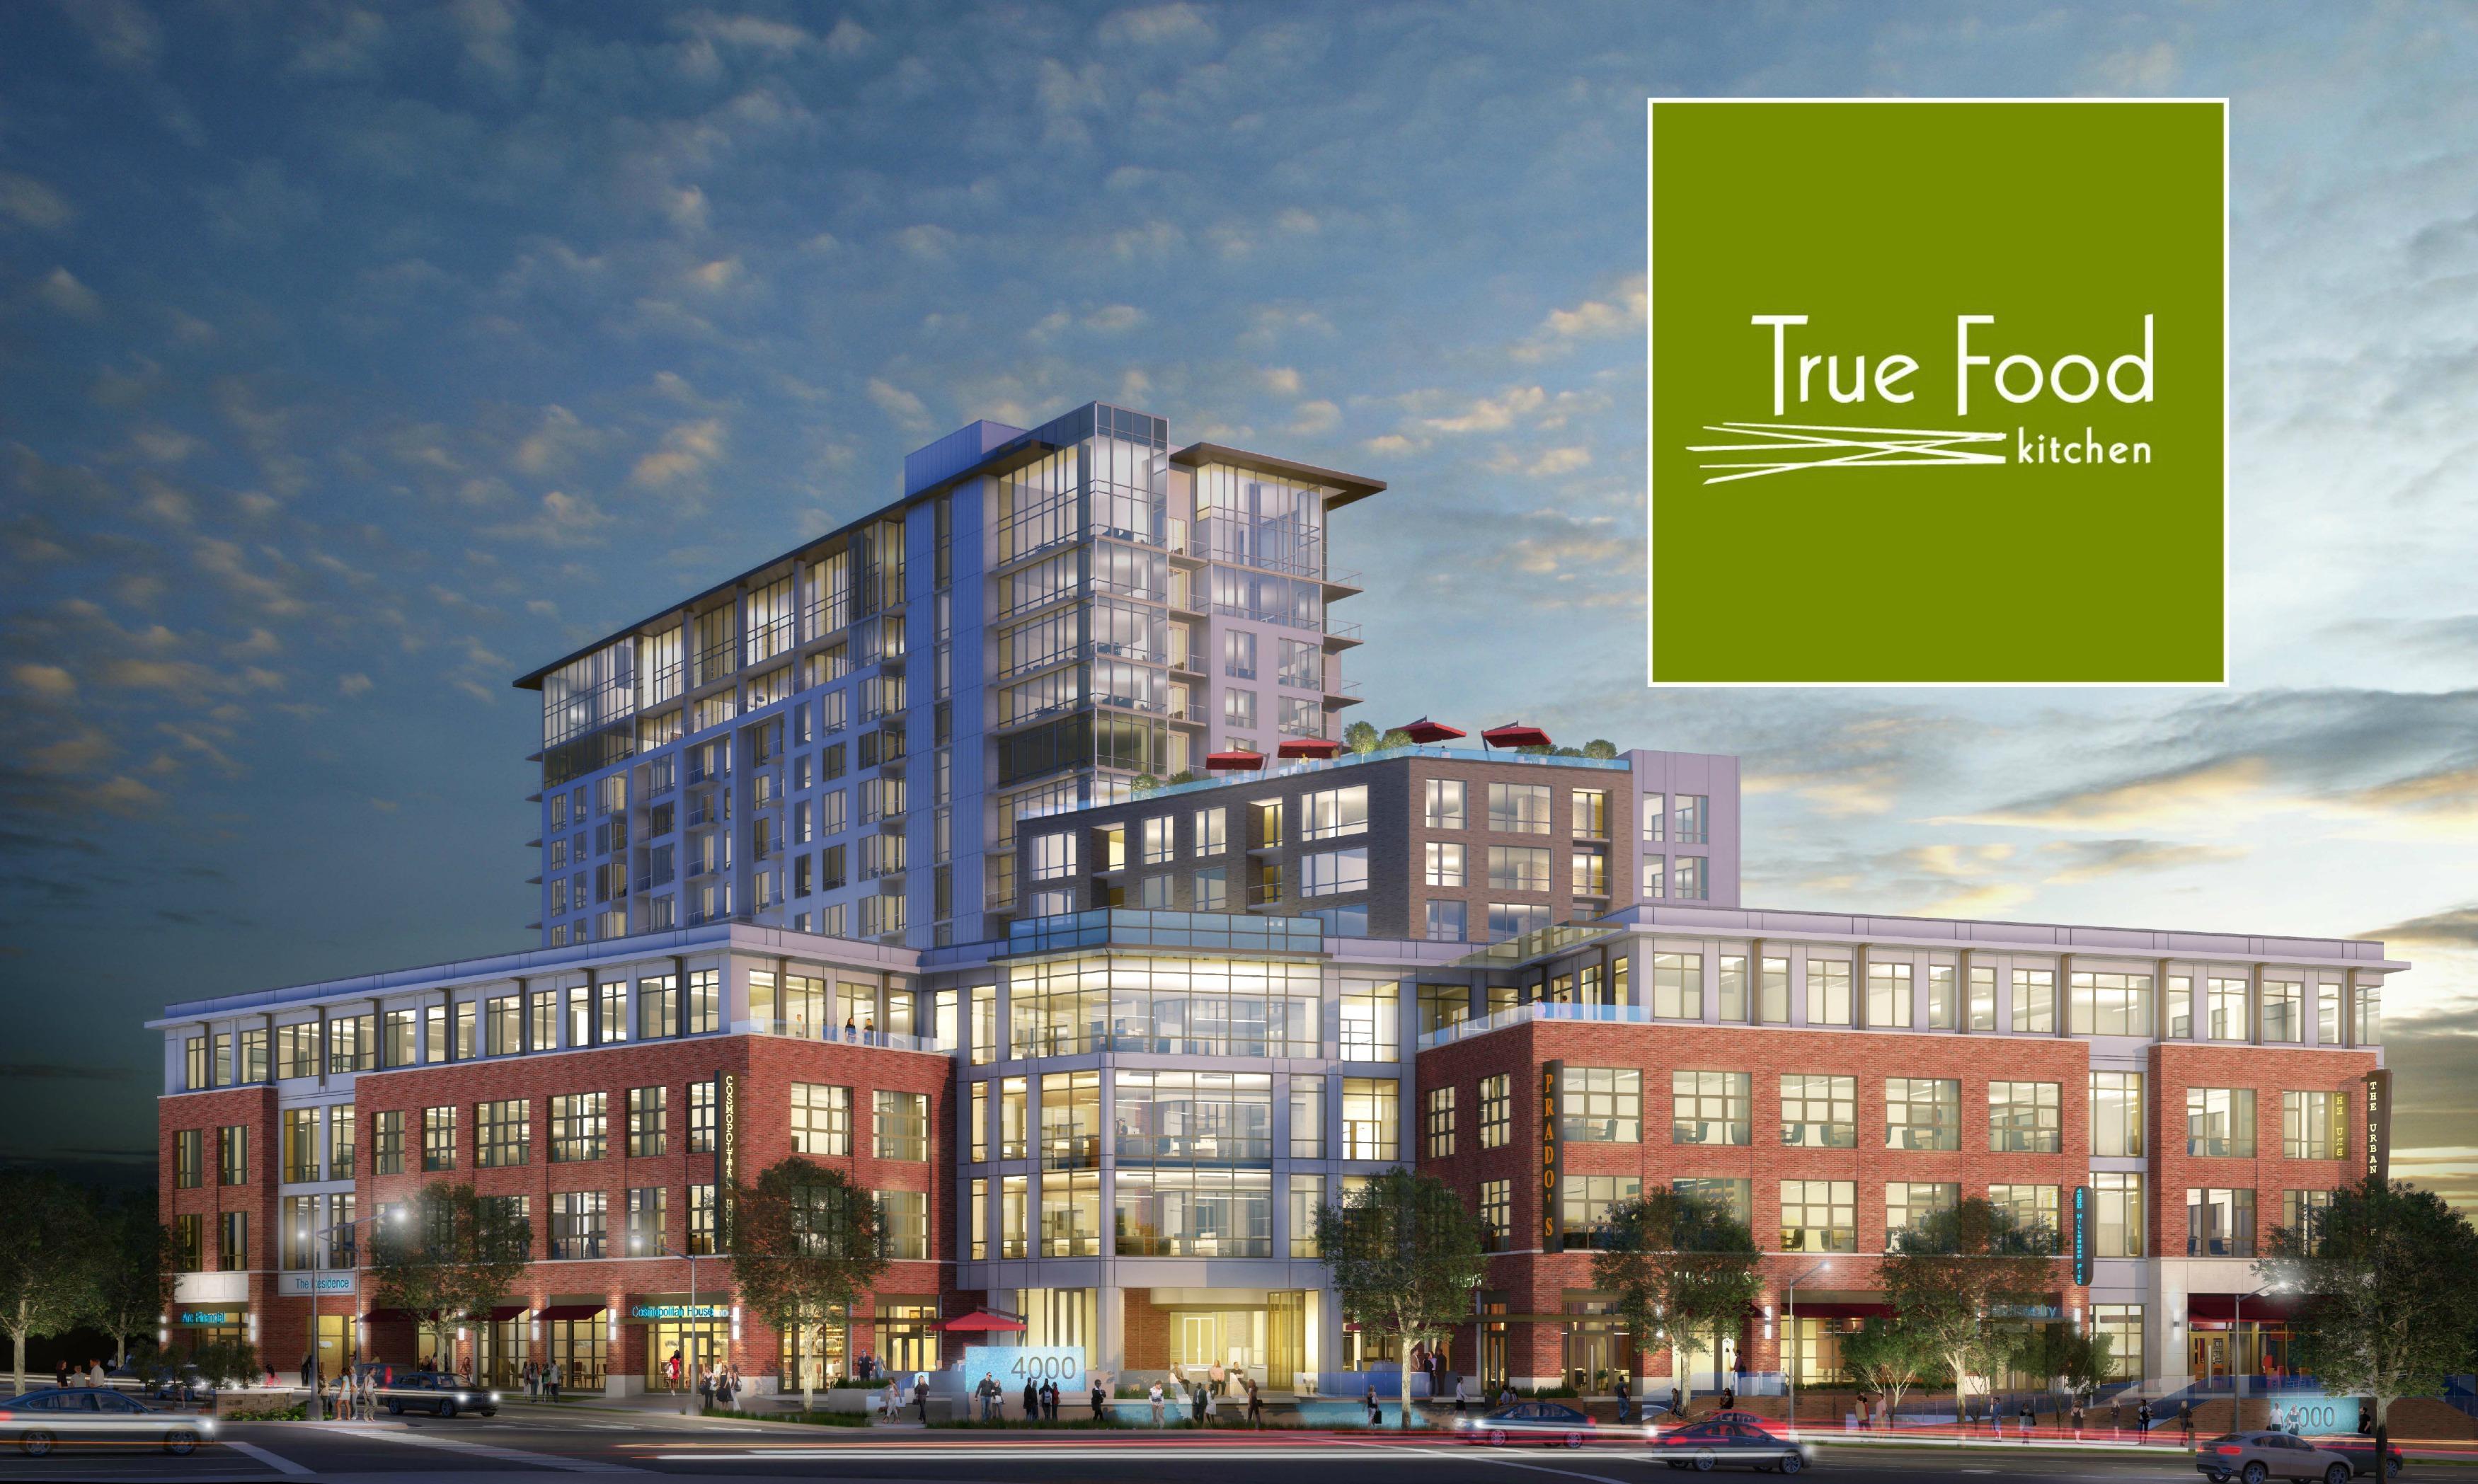 Rendering of the 4000 Hillsboro development in Green Hills.